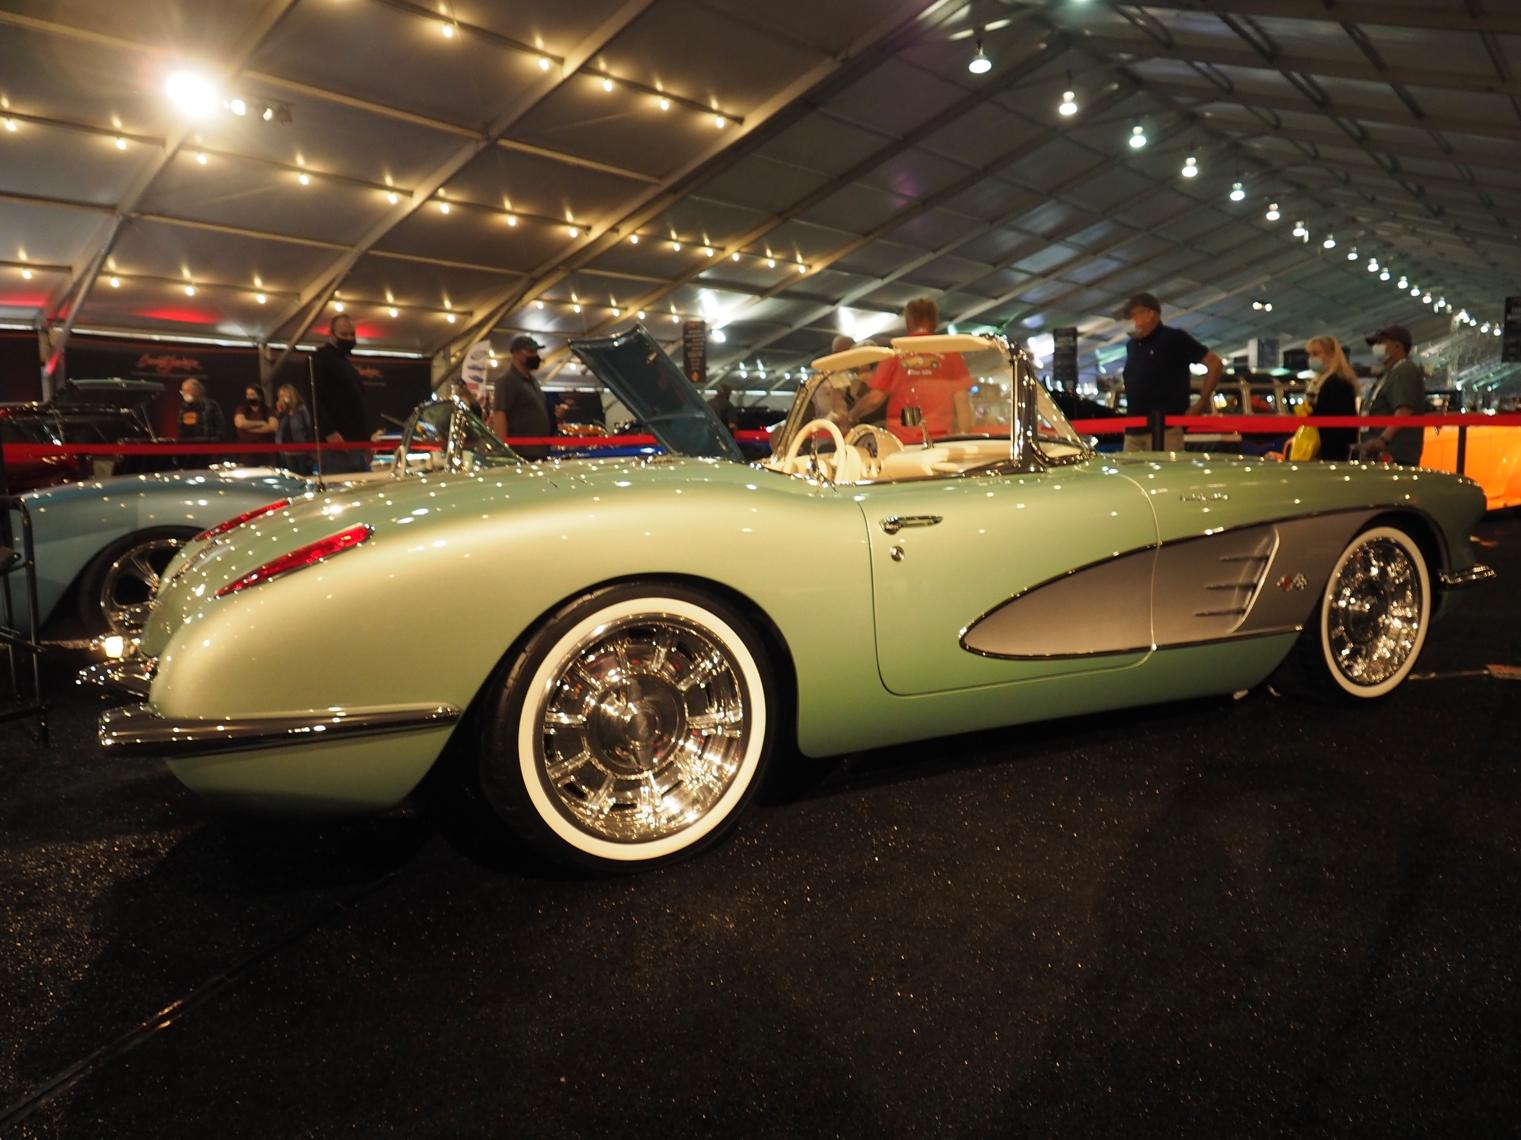 2021 Clevenger 1959 Corvette Convertible restomod